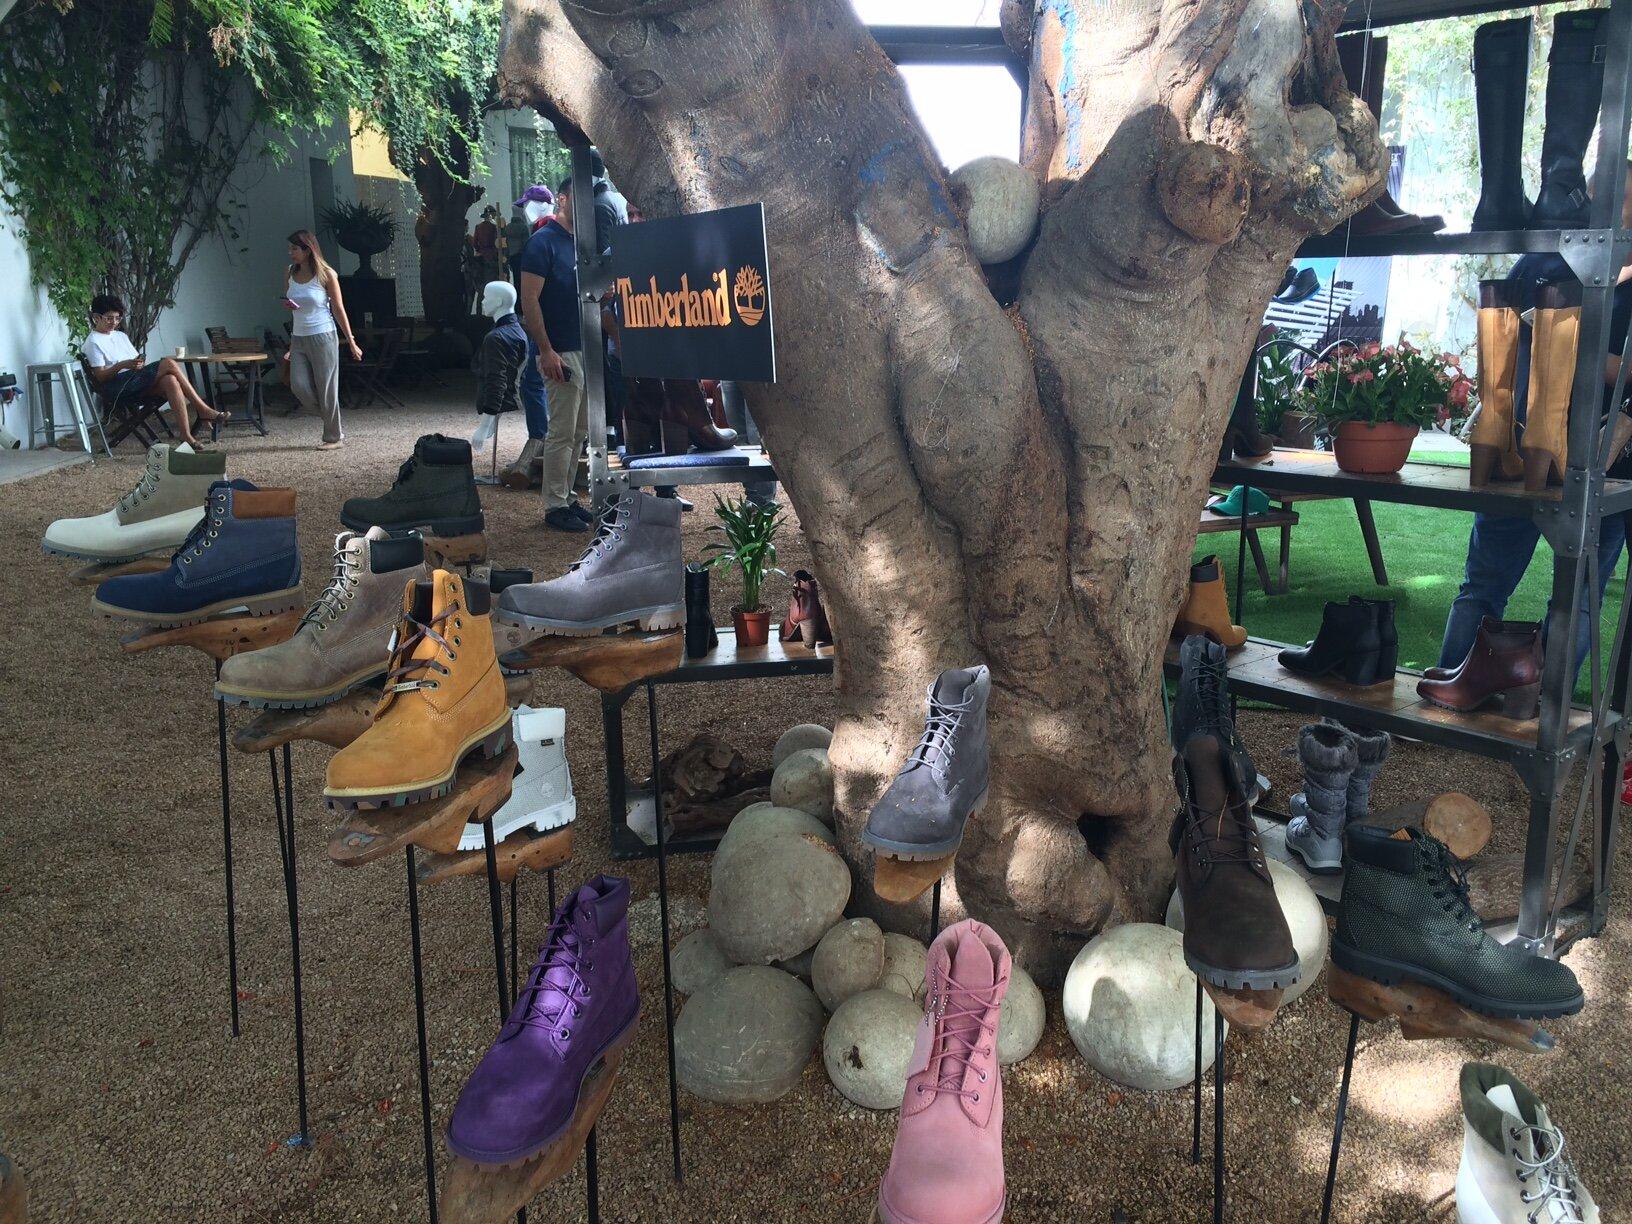 дорогие ботинки